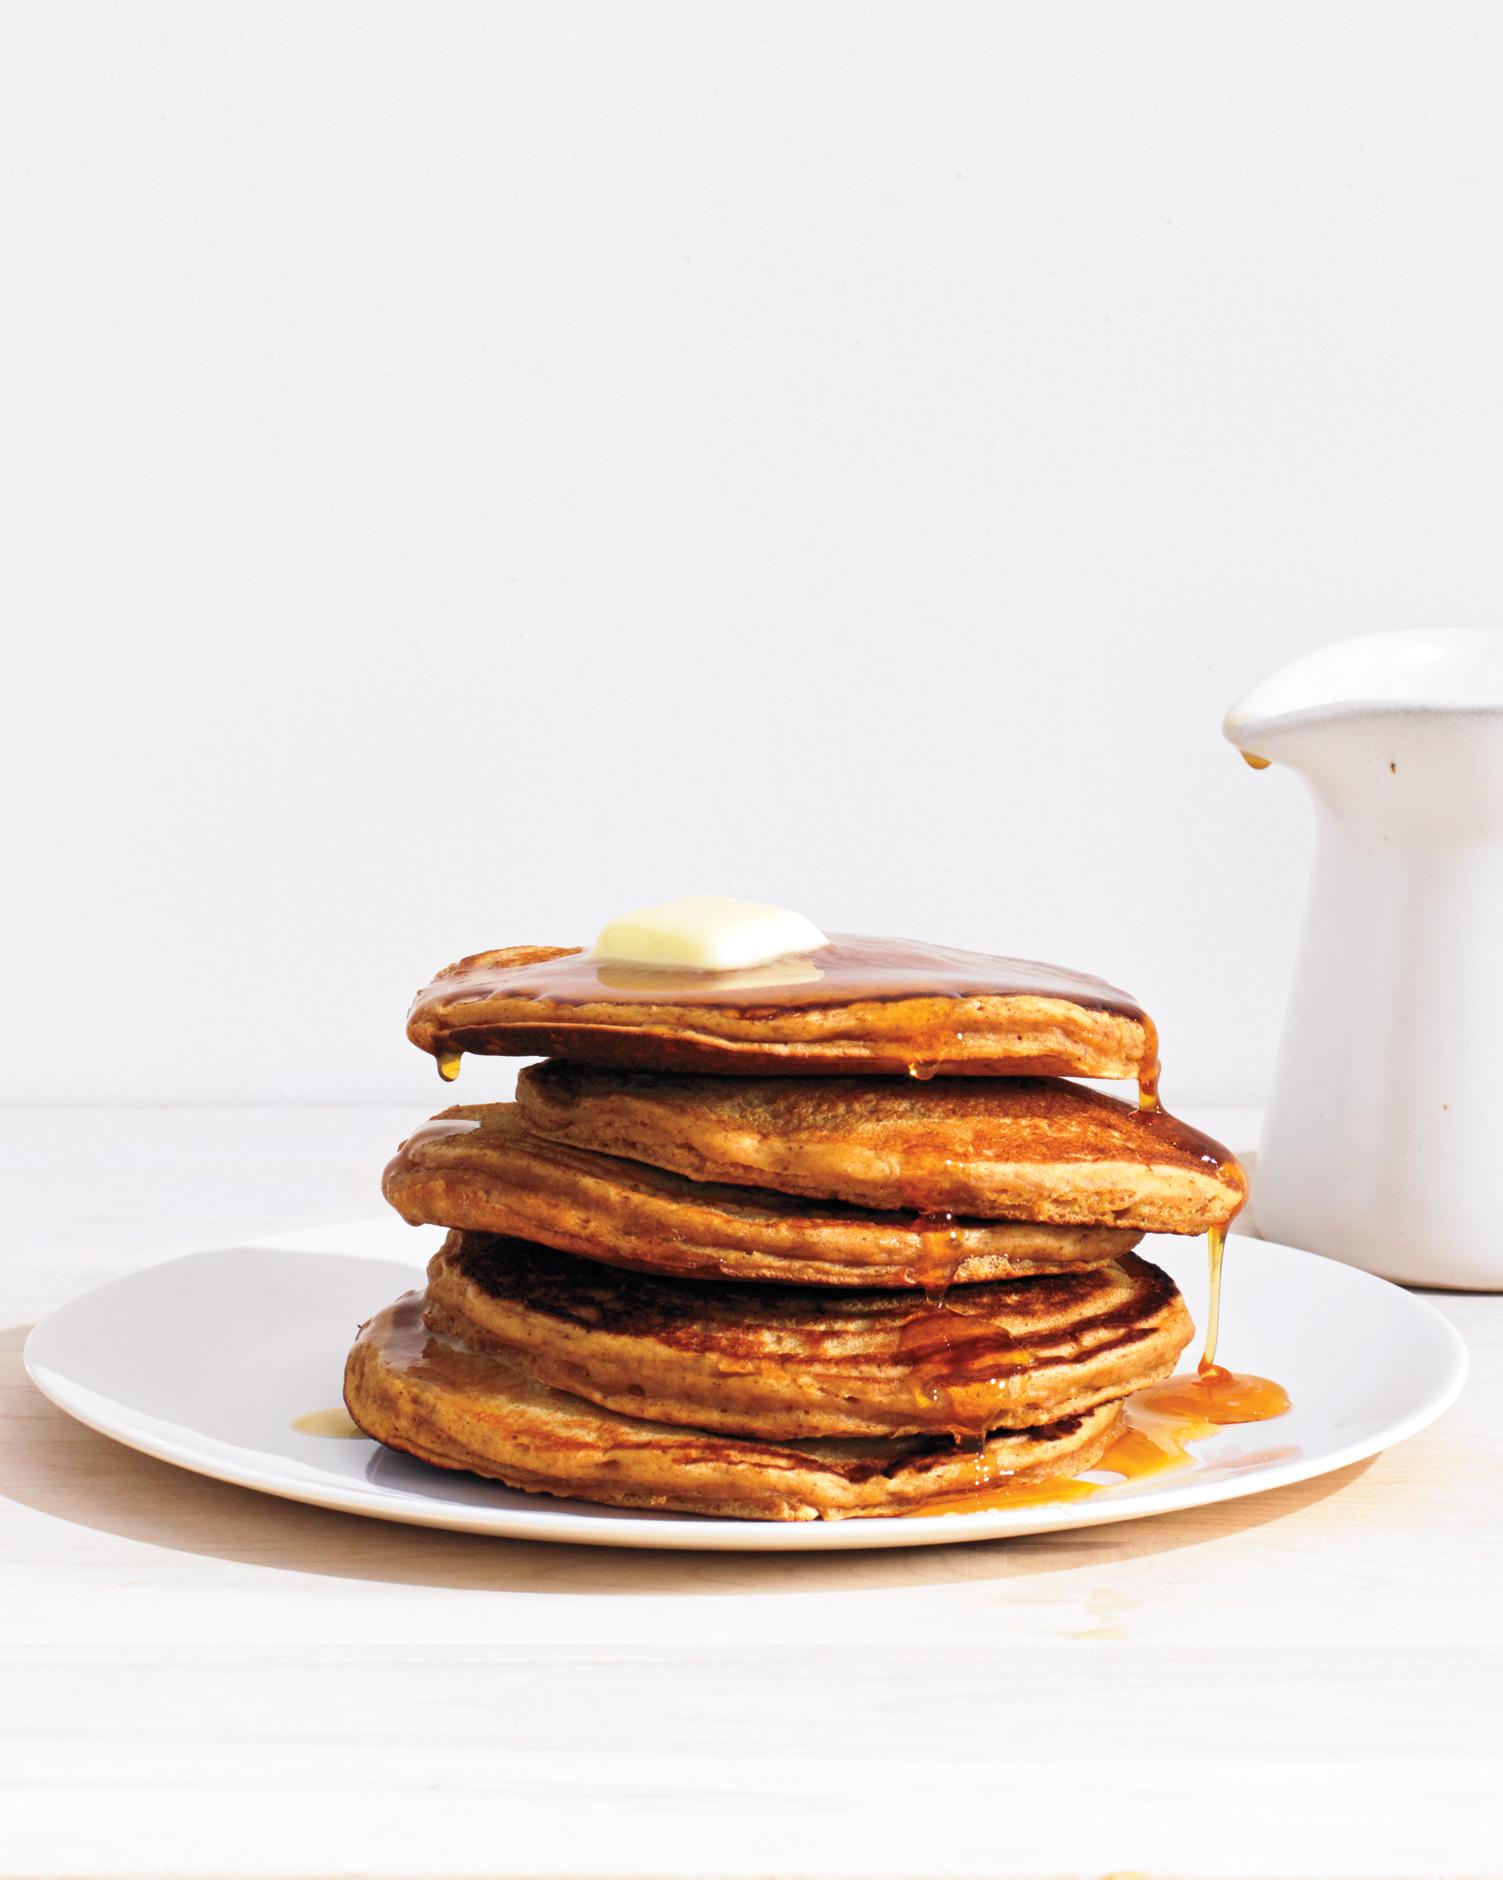 gingerbread-pancake-448-d111372.jpg